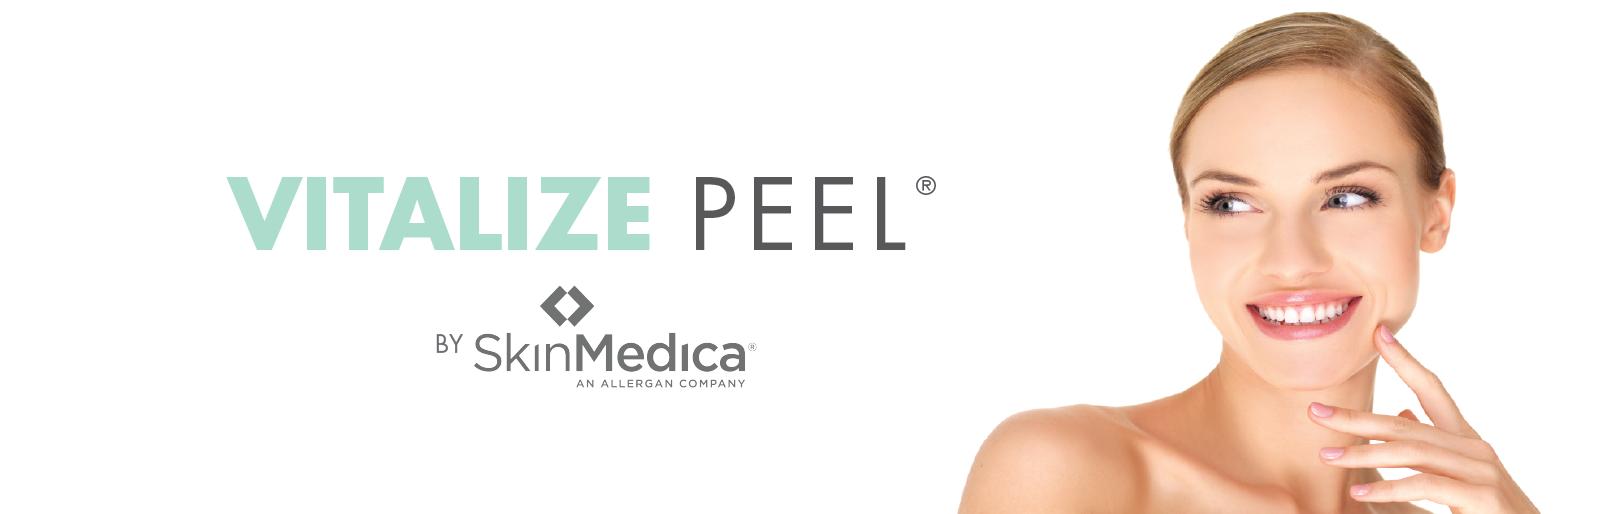 Vitalize-Peel.png